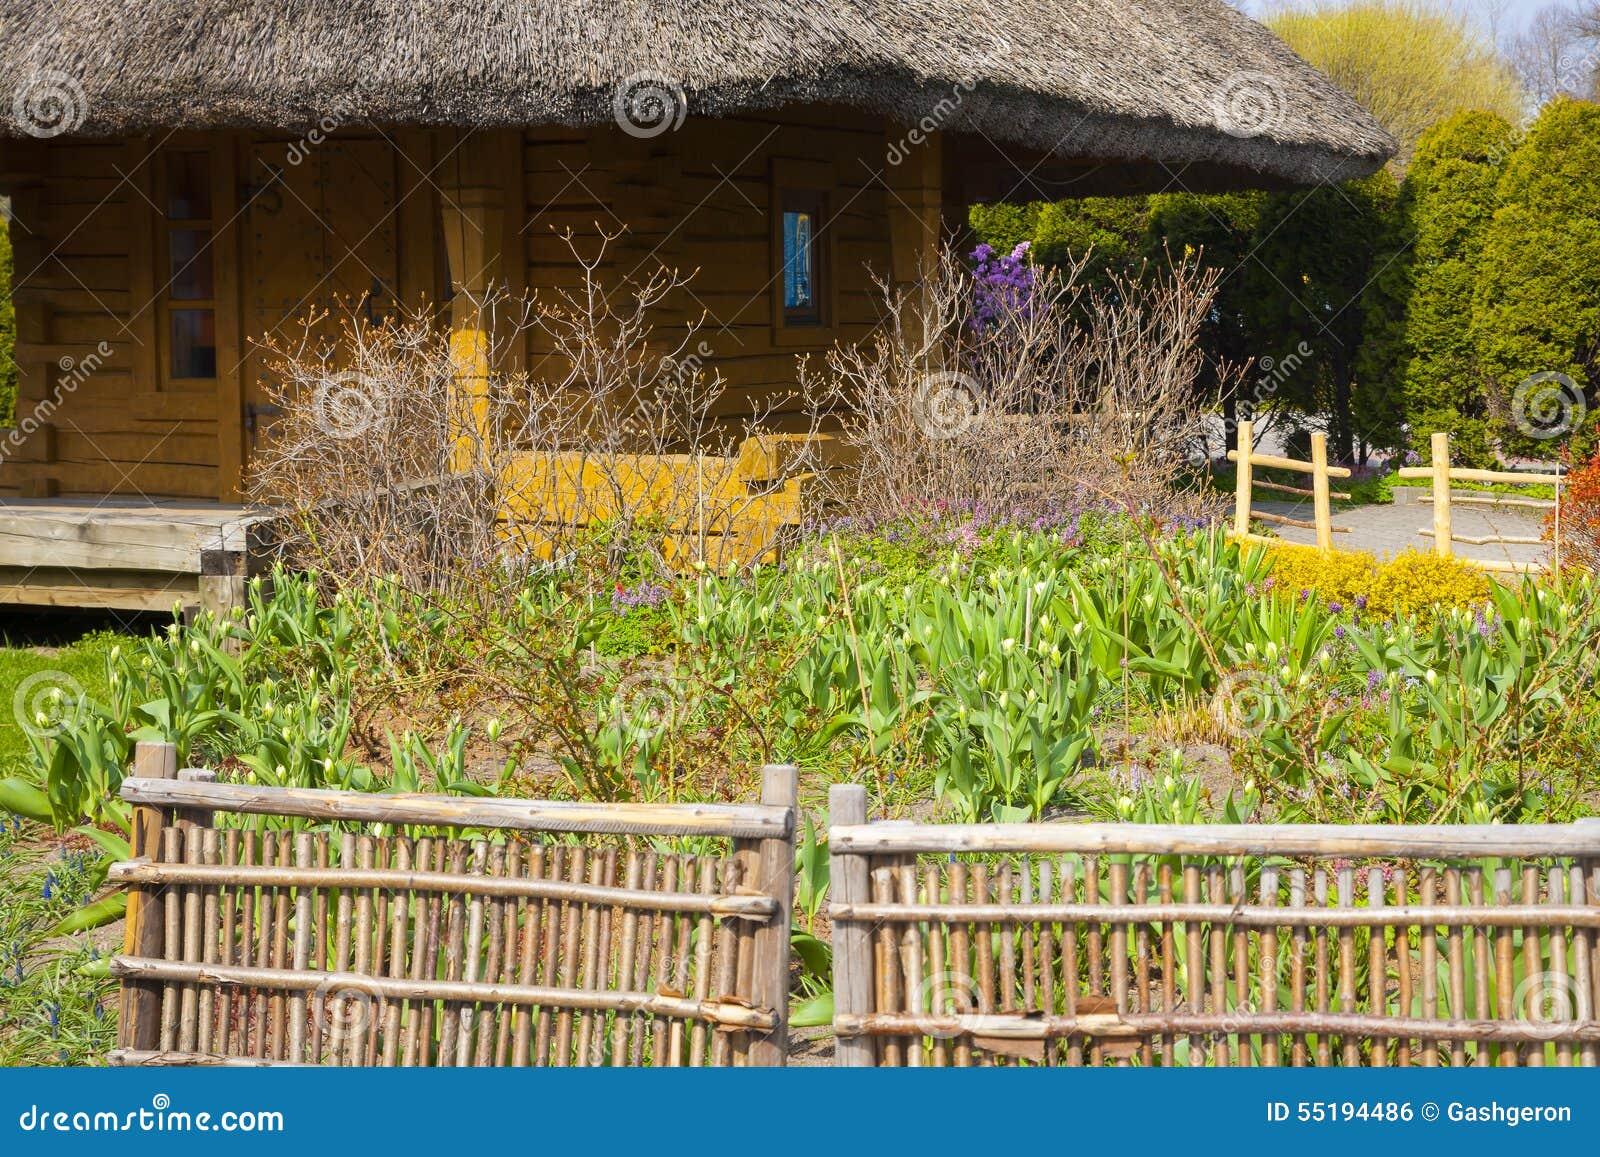 9b426412b9f7 Κήπος σε ένα εξοχικό σπίτι στοκ εικόνες. εικόνα από φυτά - 55194486